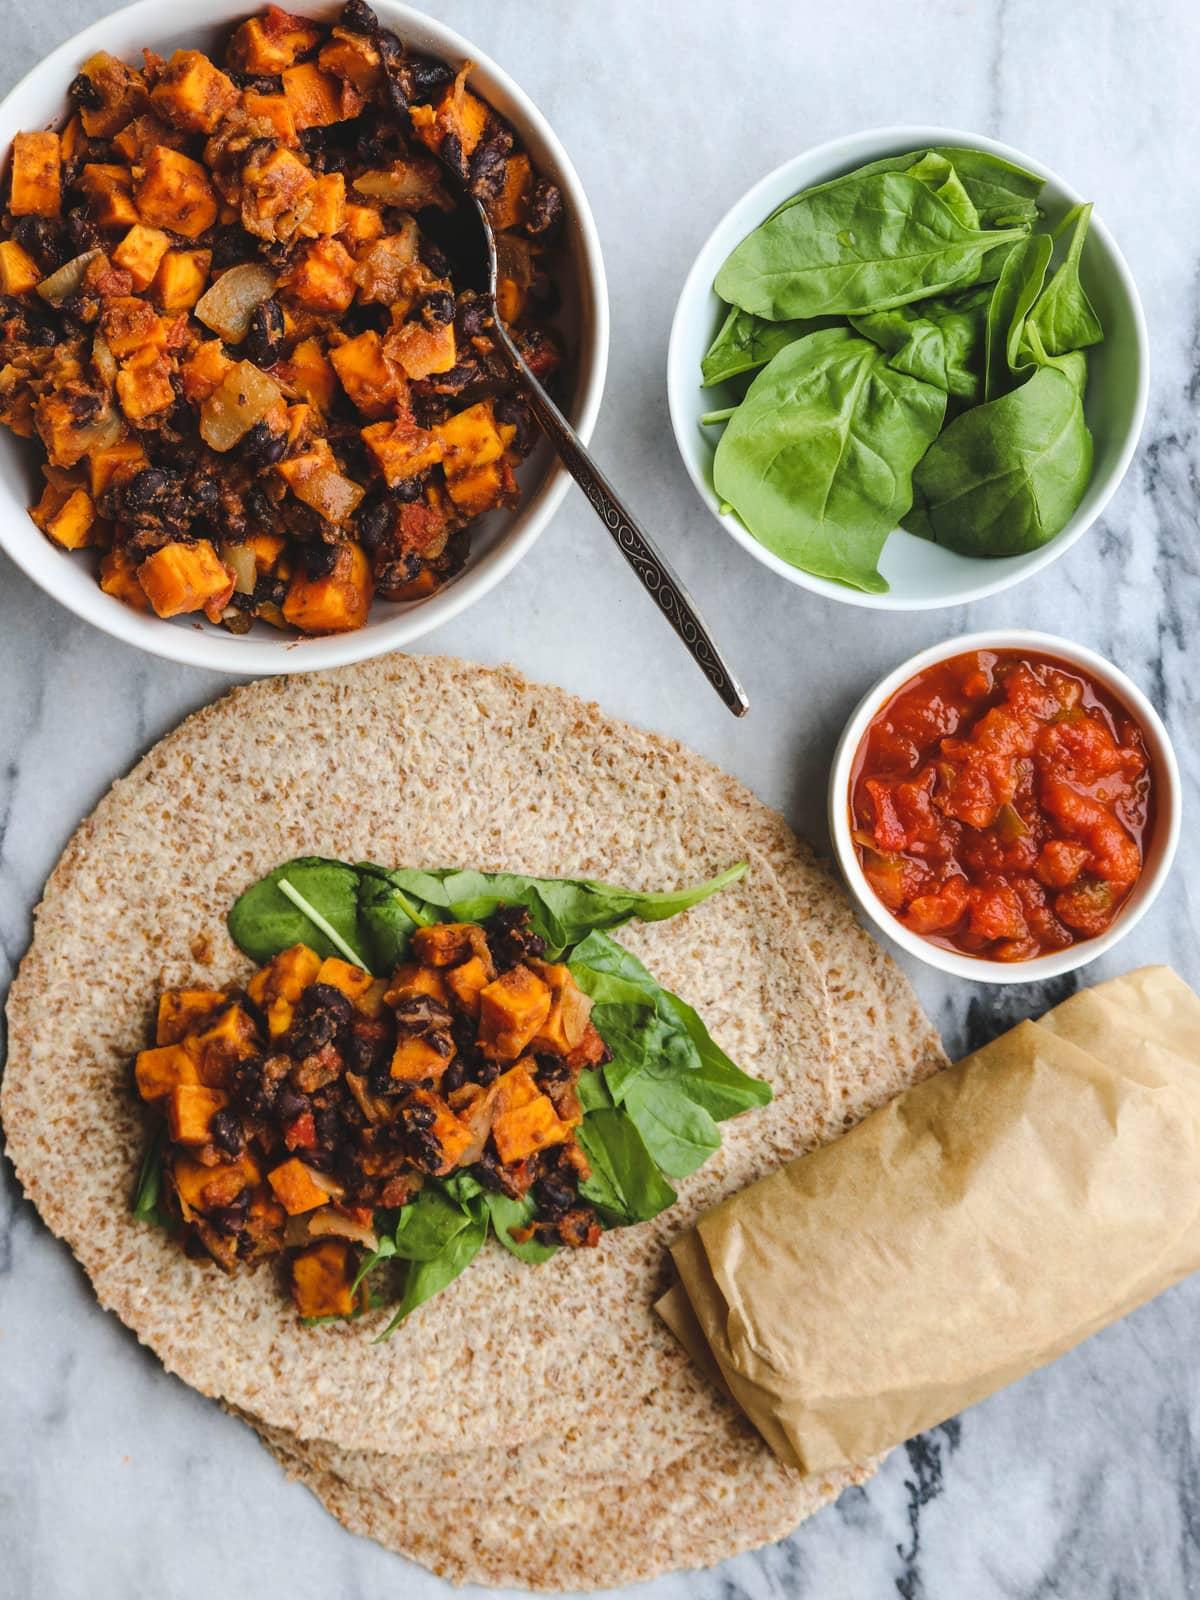 Sweet Potato And Black Bean Vegan Breakfast Burritos From My Bowl